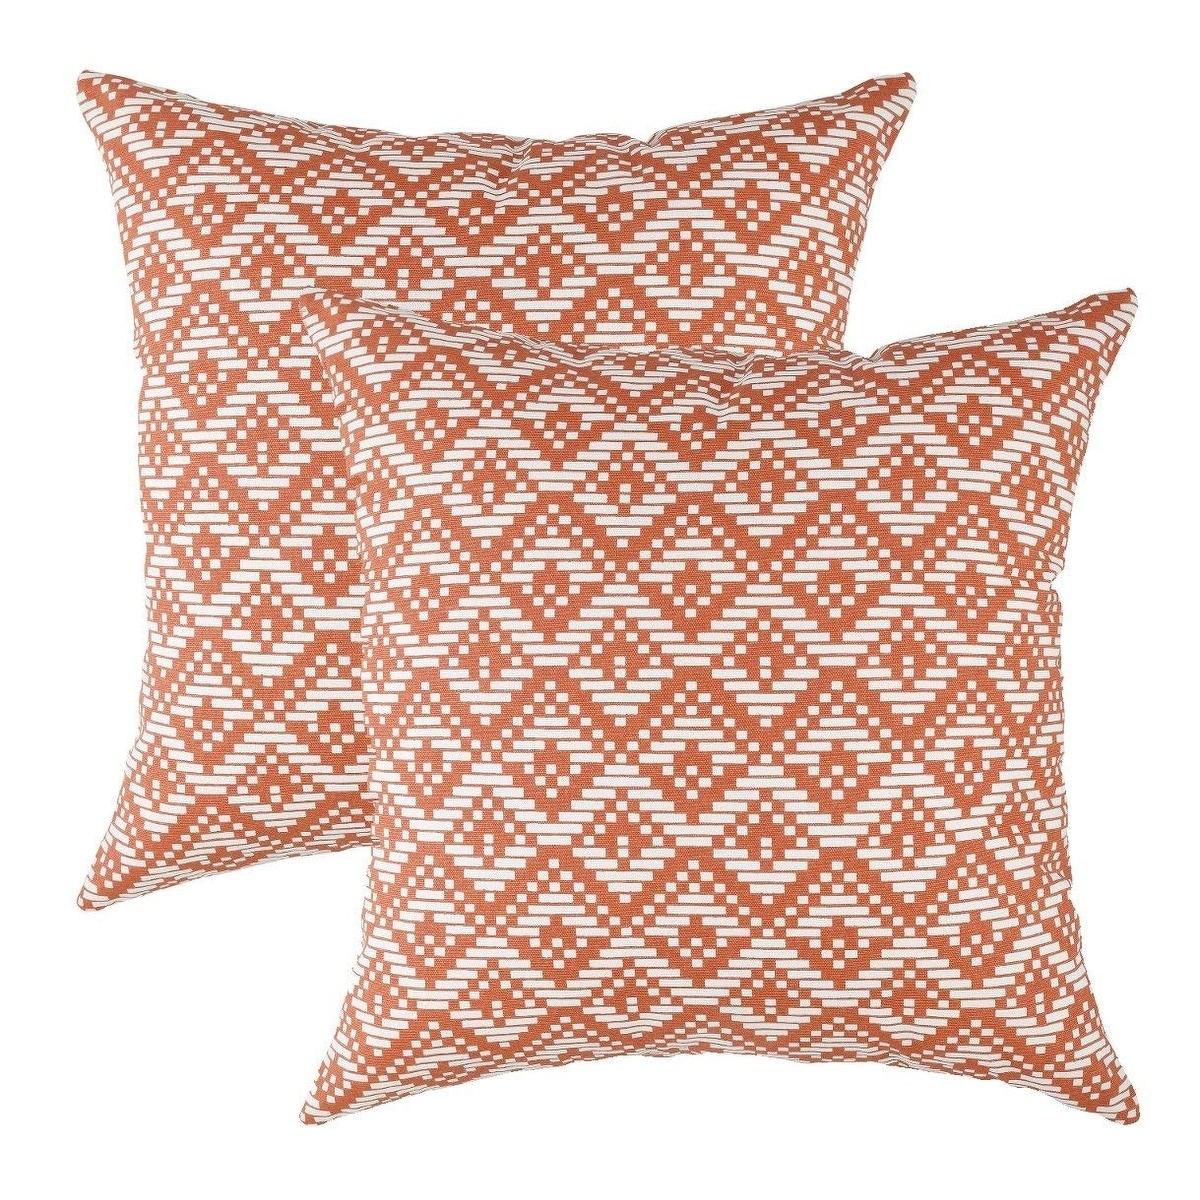 100/% Cotton Velvet Pillow Covers Shams Set of 2 Home Decor Cushion Rust